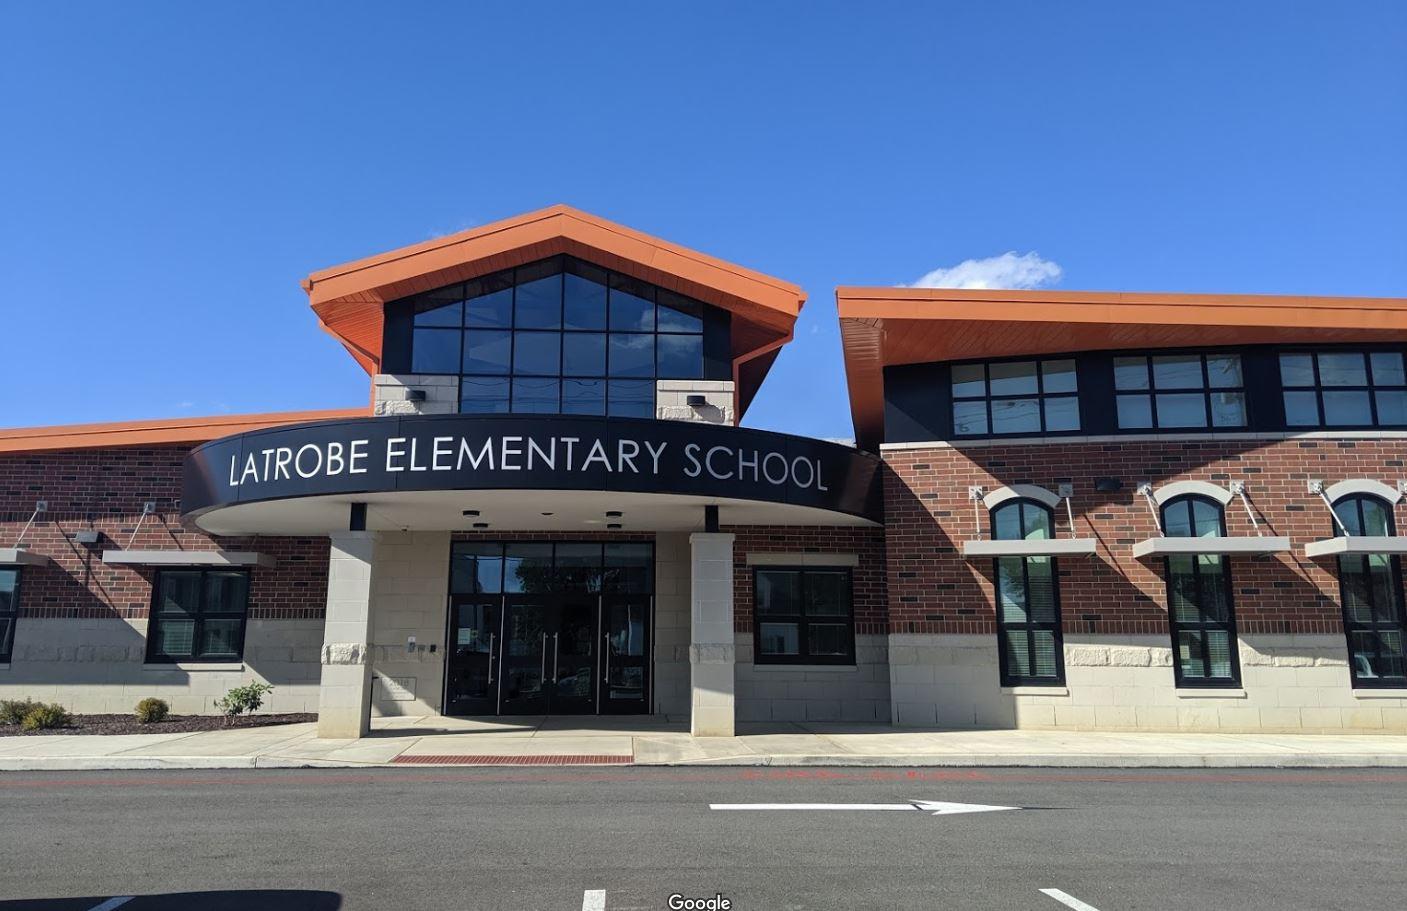 Latrobe Elementary School